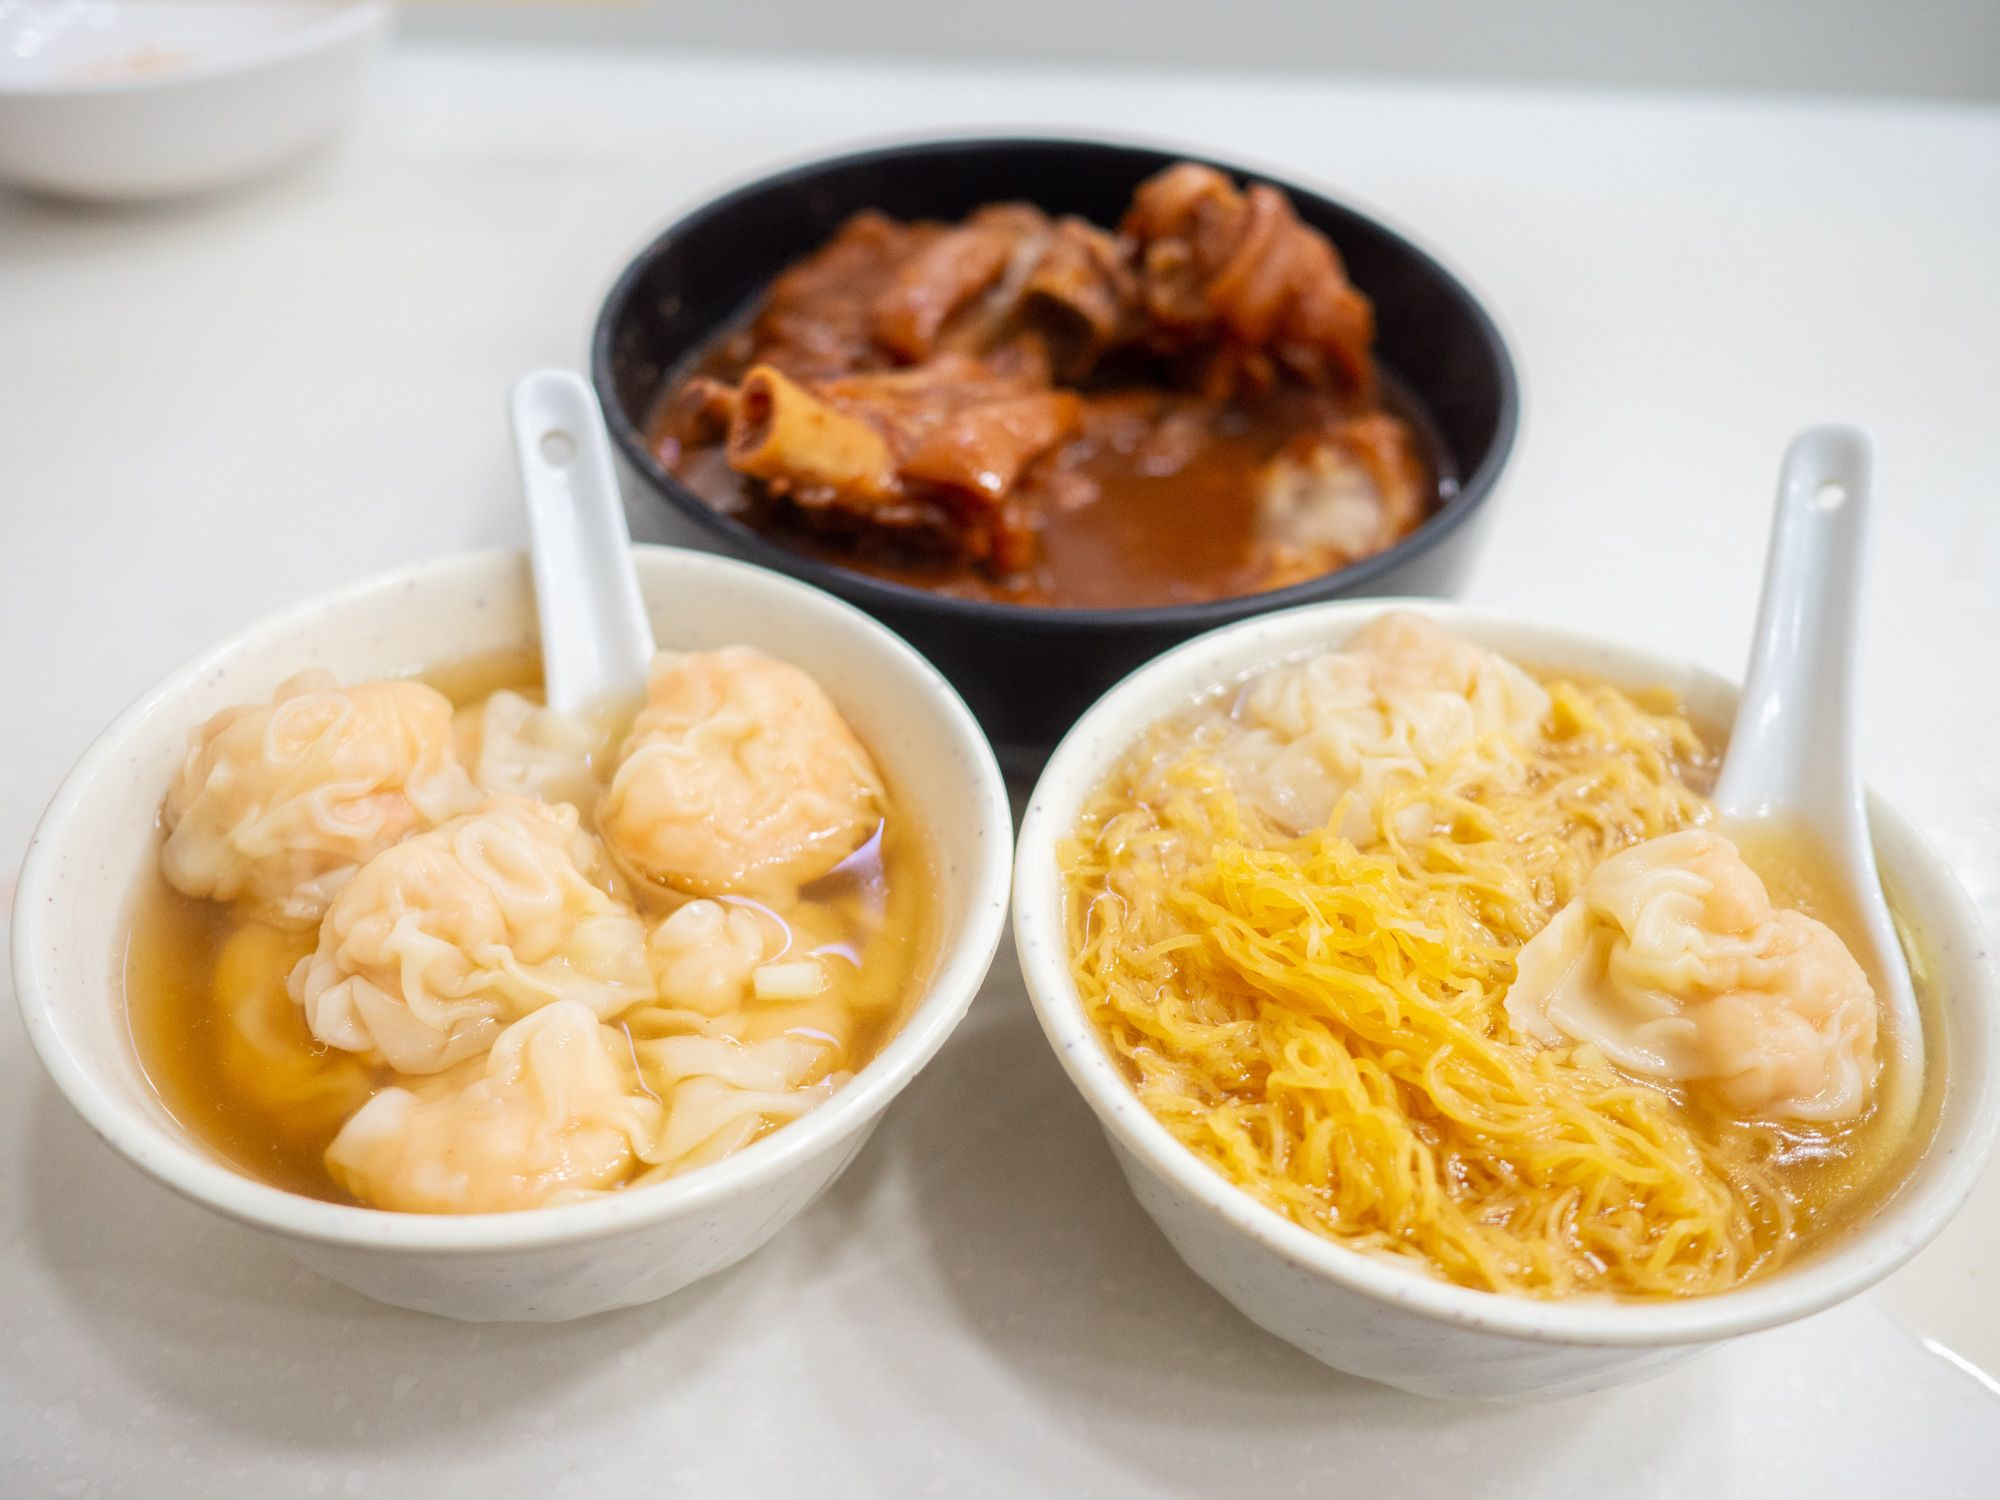 wonton noodles, pig foot, and a big bowl of shrimp wontons at mak an kee